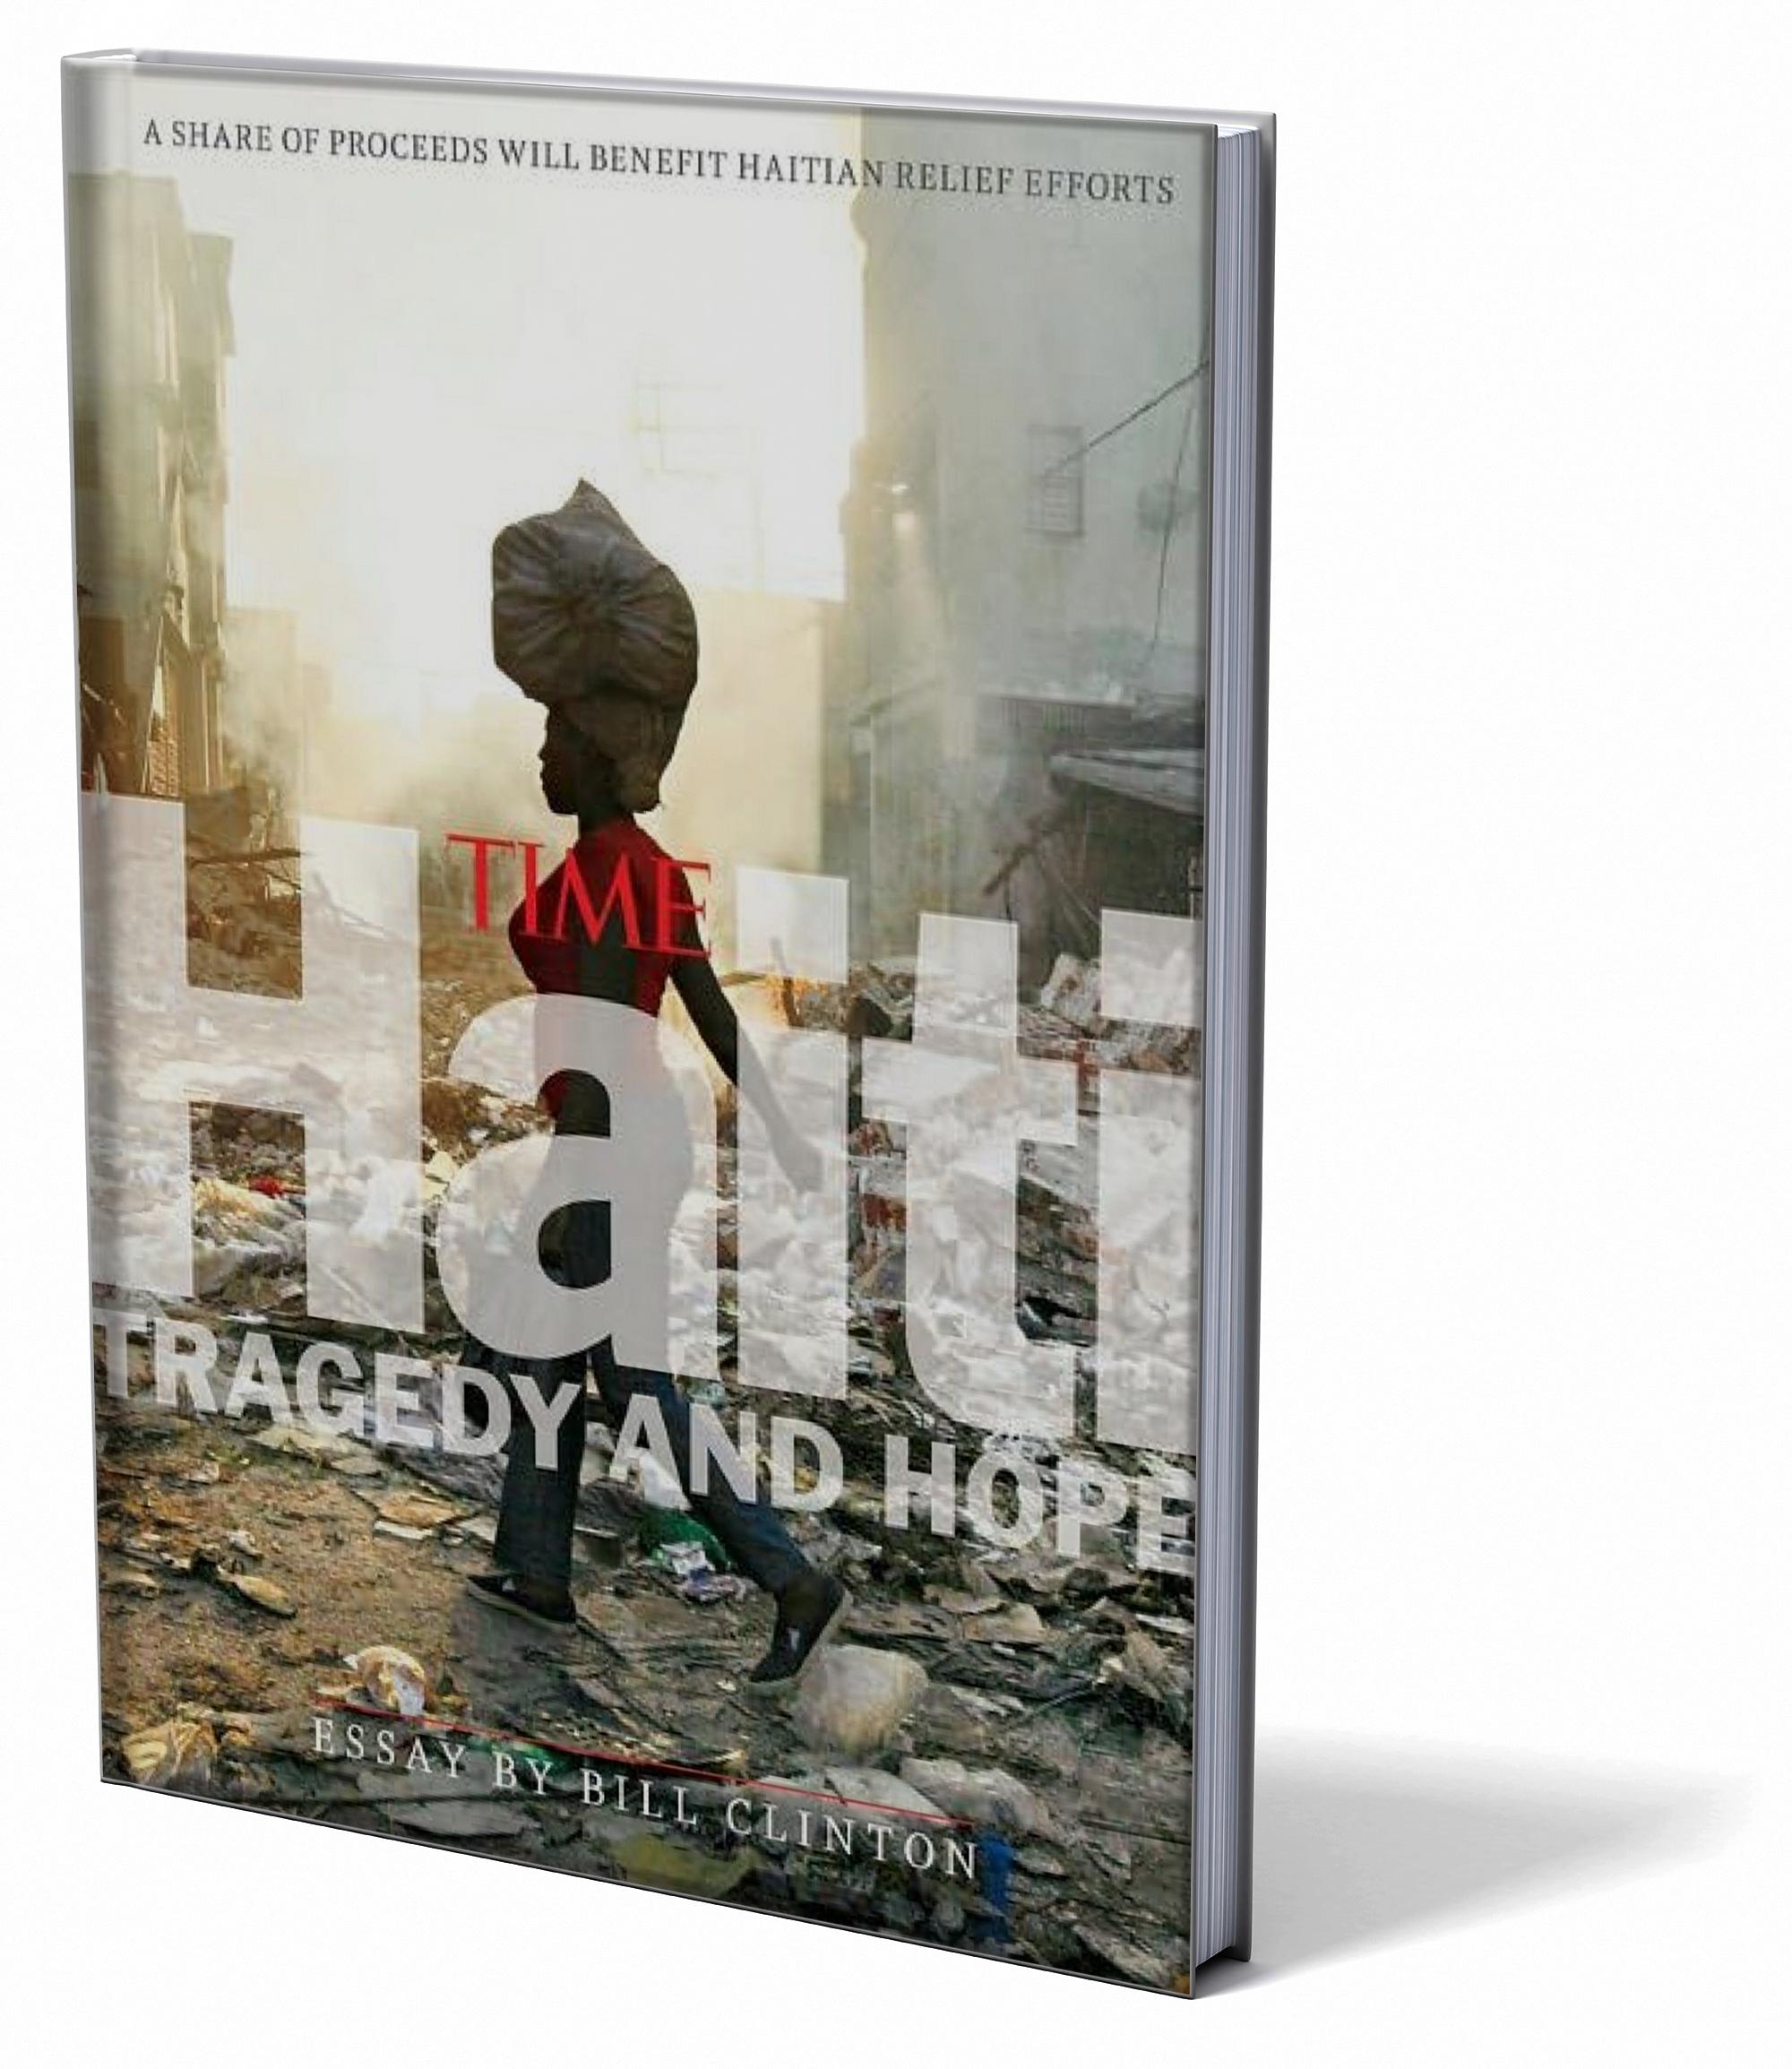 Haiti. Tragedy and Hope